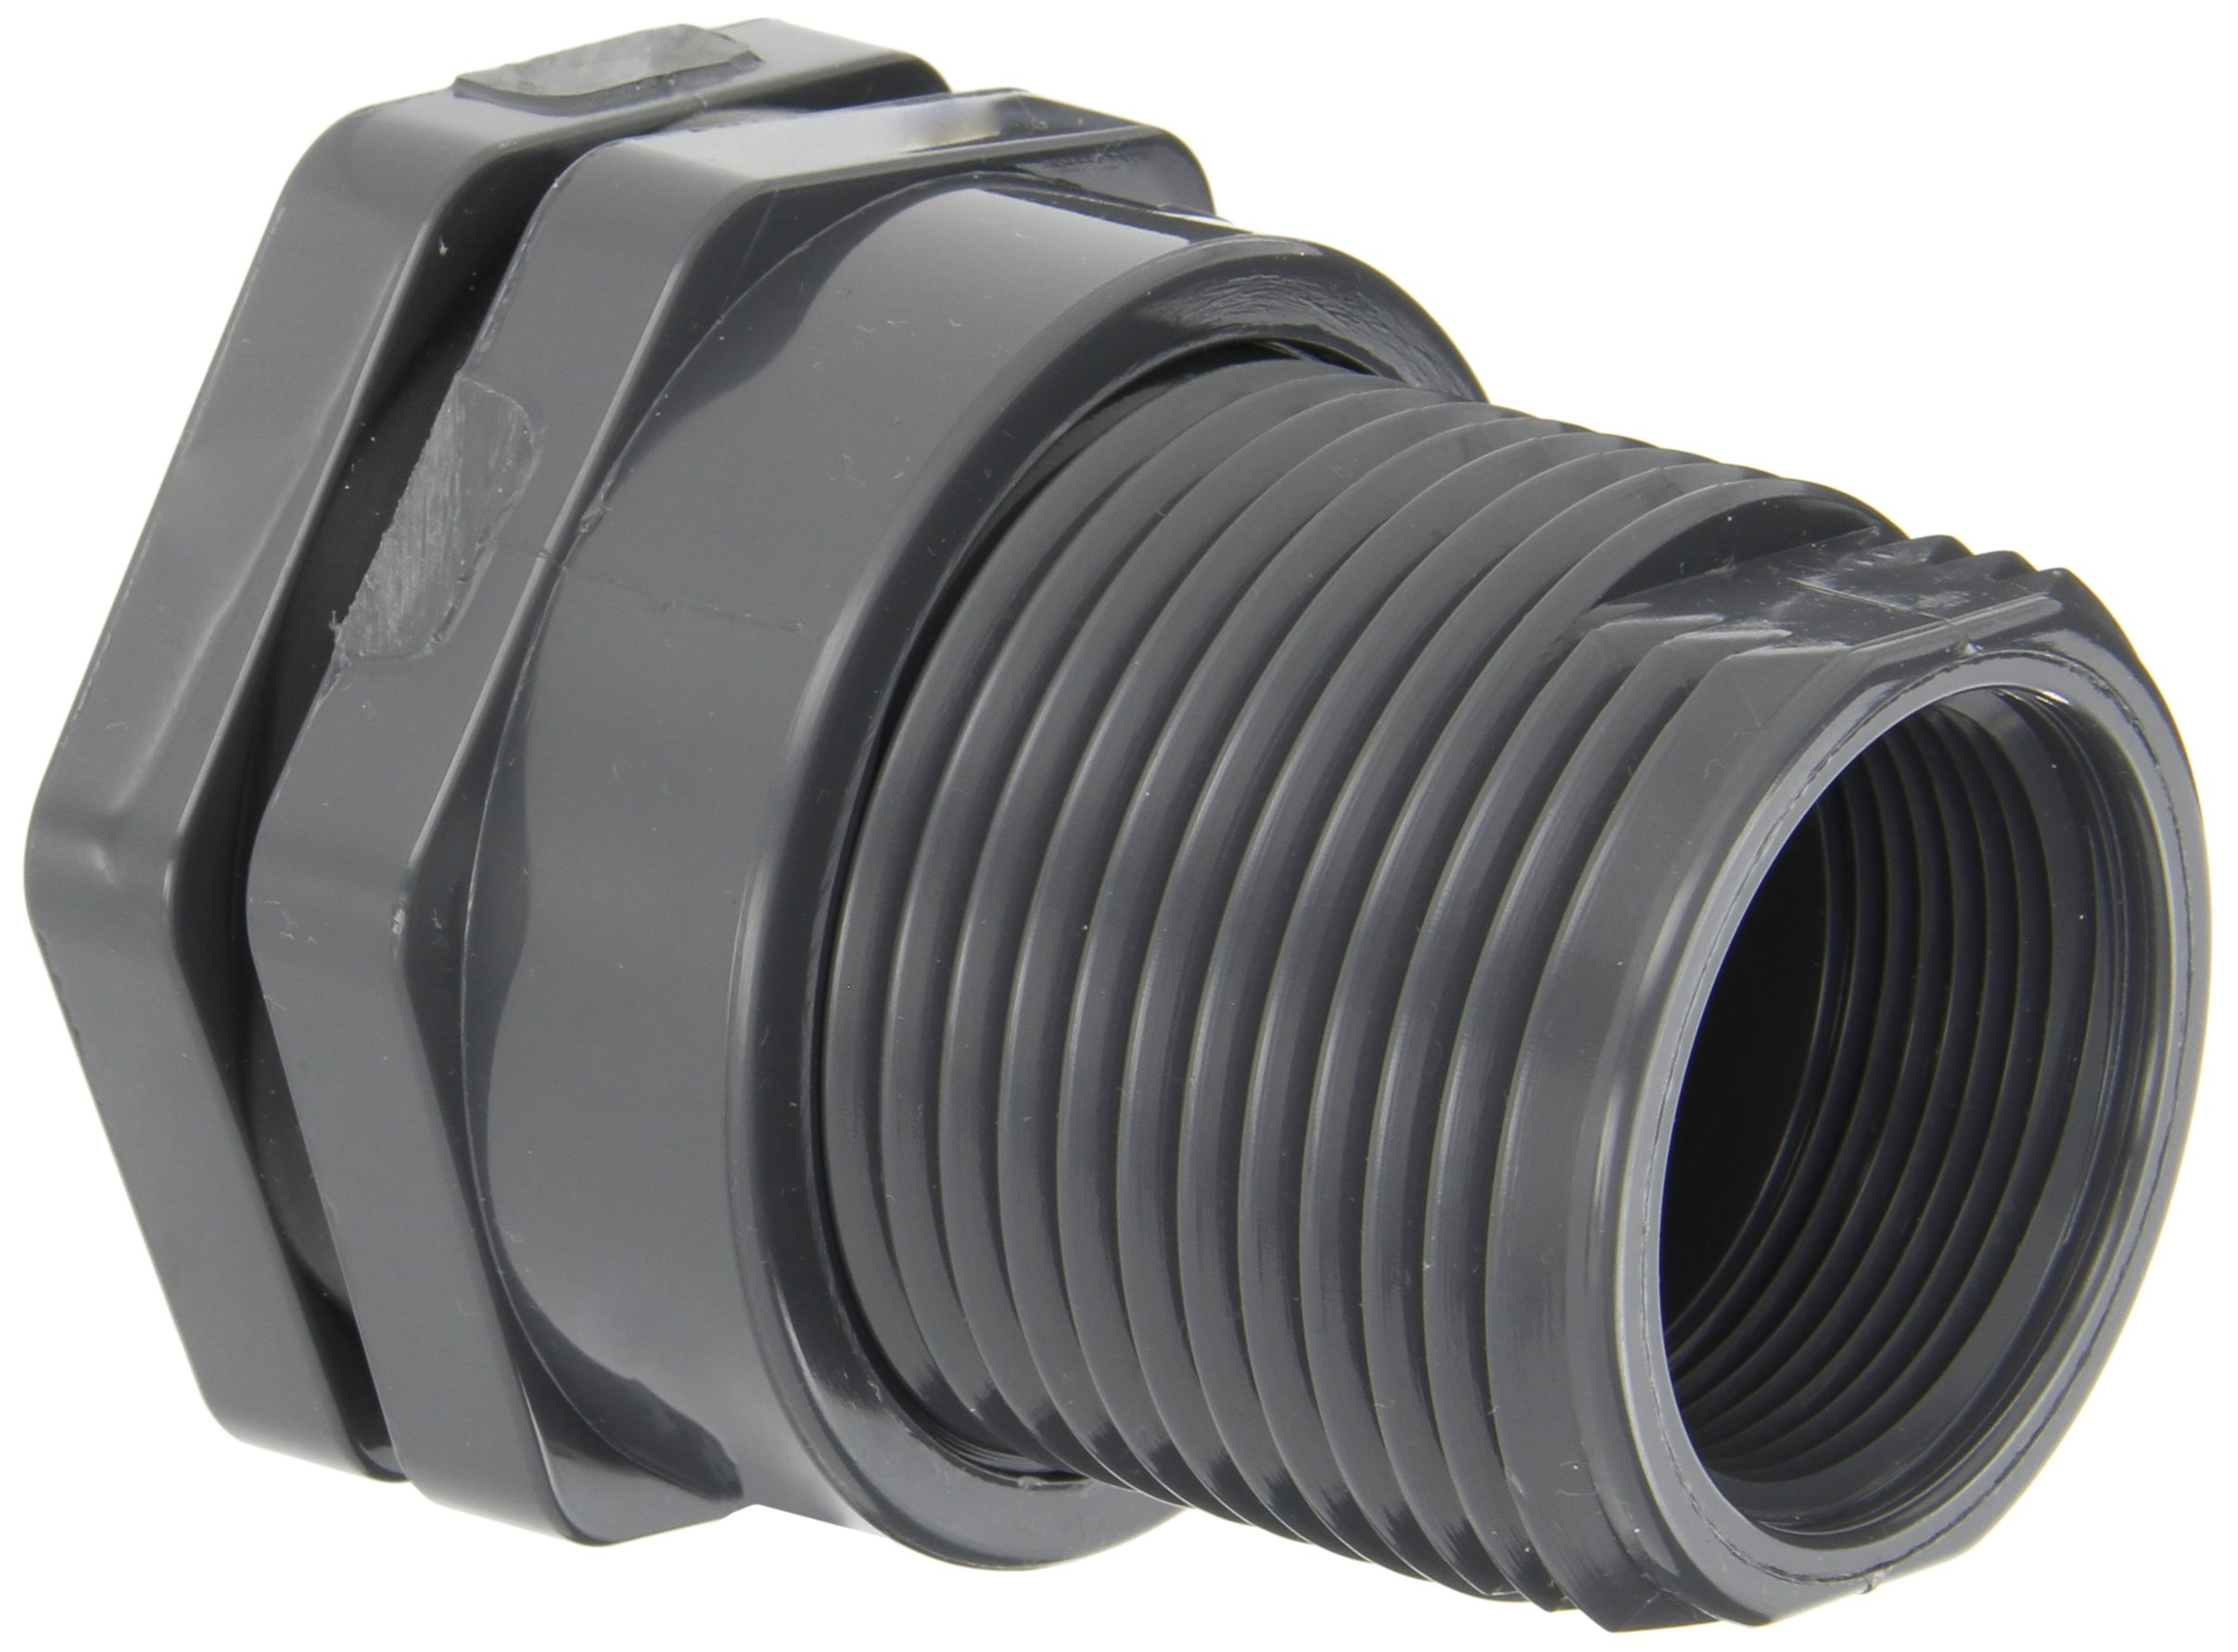 Hayward BFA1015CES Series BFA Standard Flange Bulkhead Fitting, Socket x Threaded End, PVC with EPDM Seals, 1-1/2'' Size